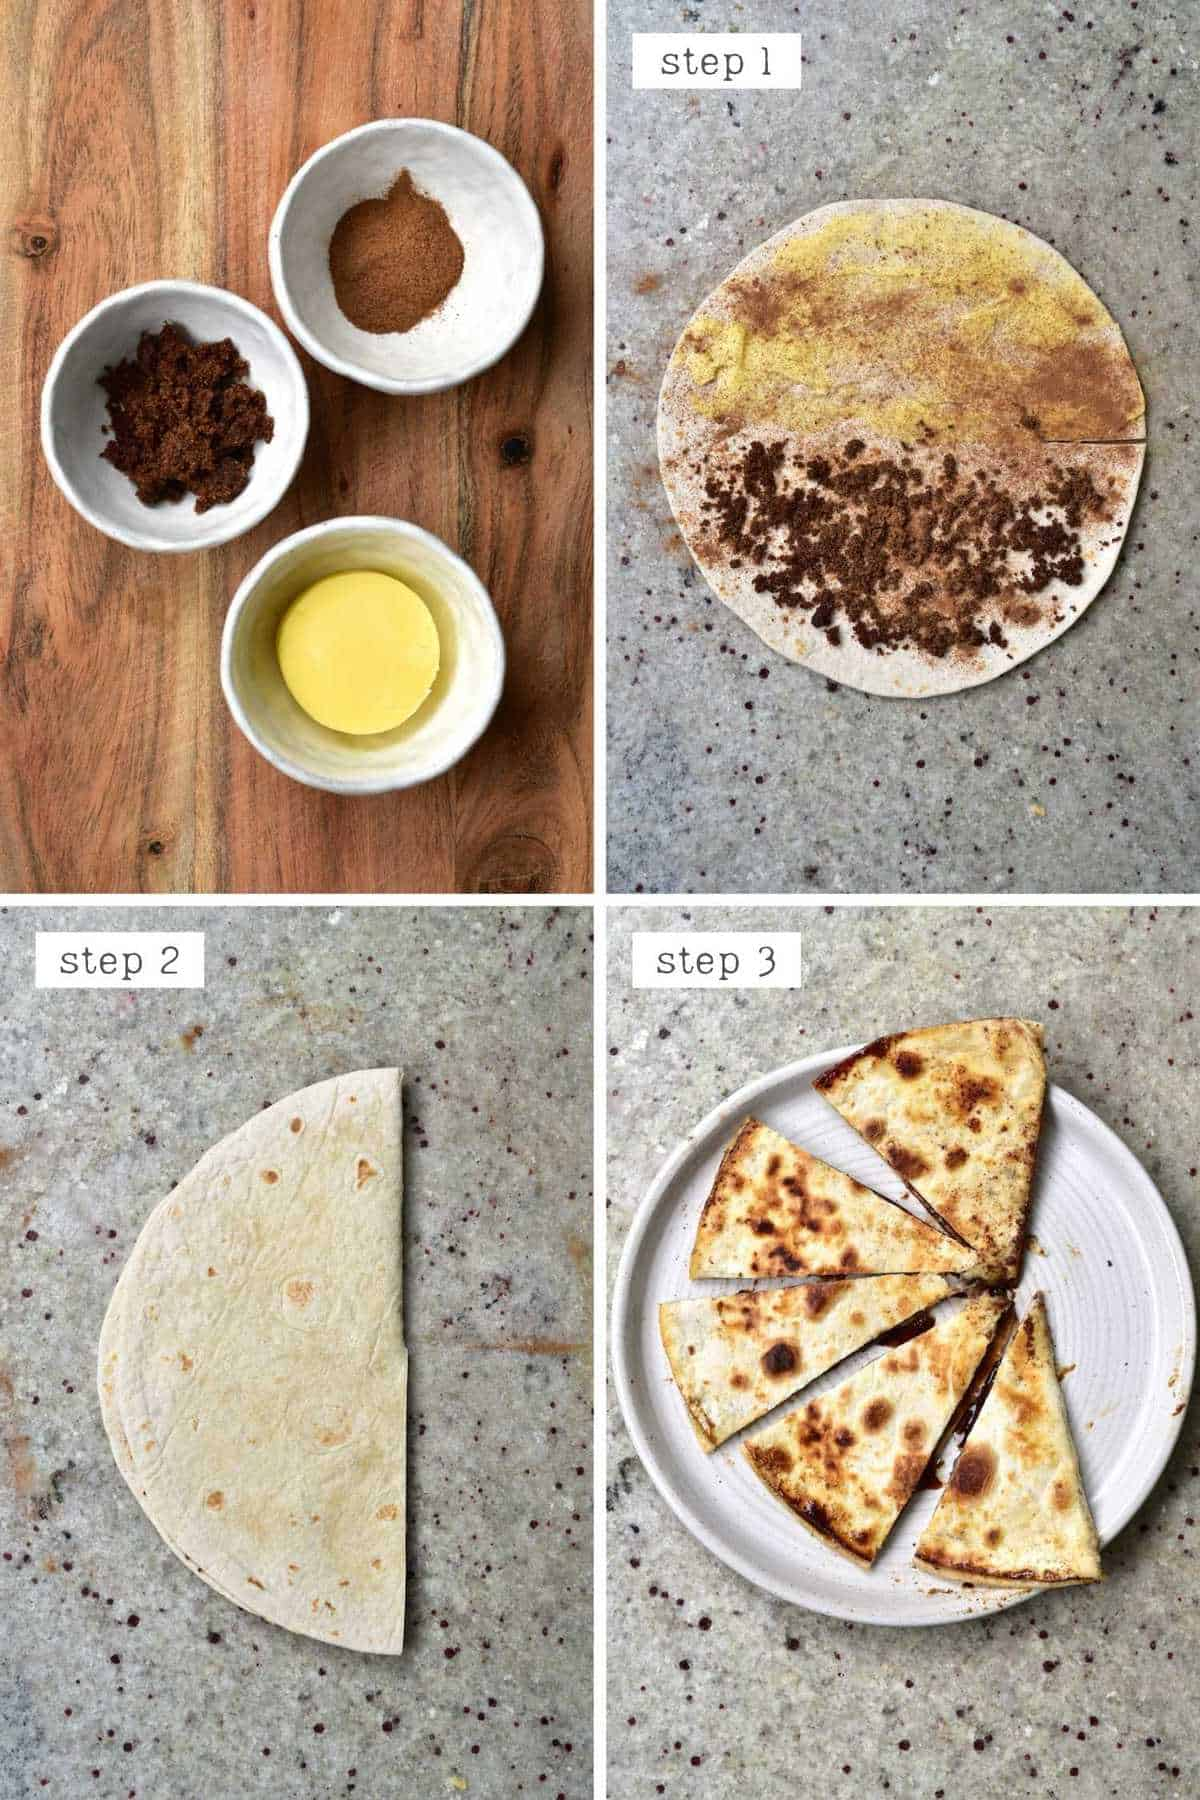 Steps for making a cinnamon butter tortilla